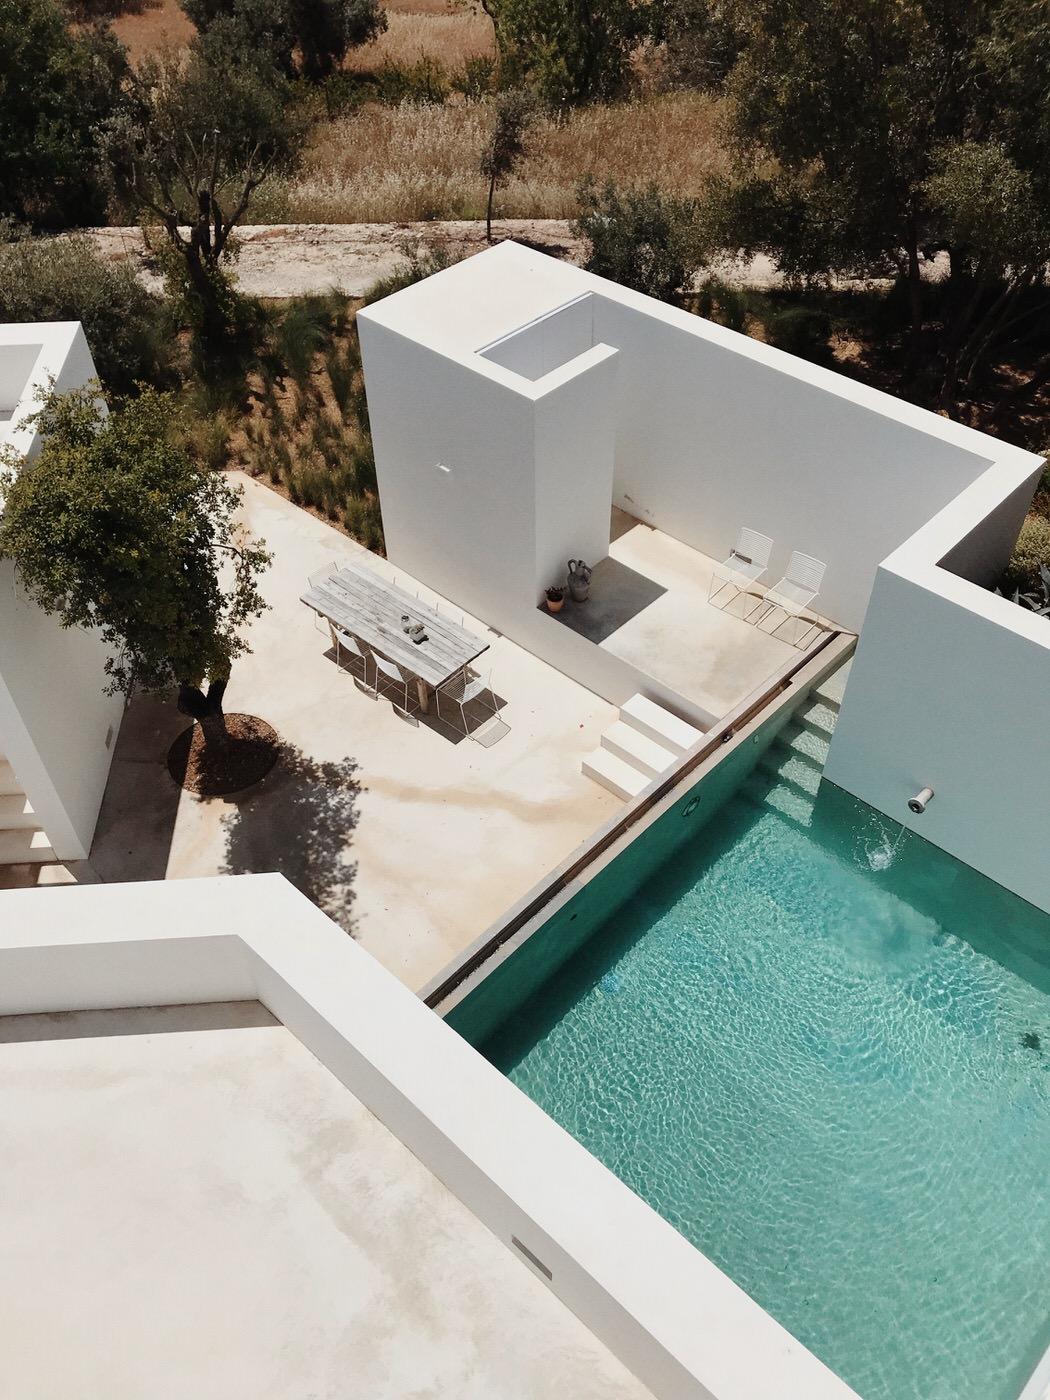 Zalig-Algarve-Casa-Luum-176-1